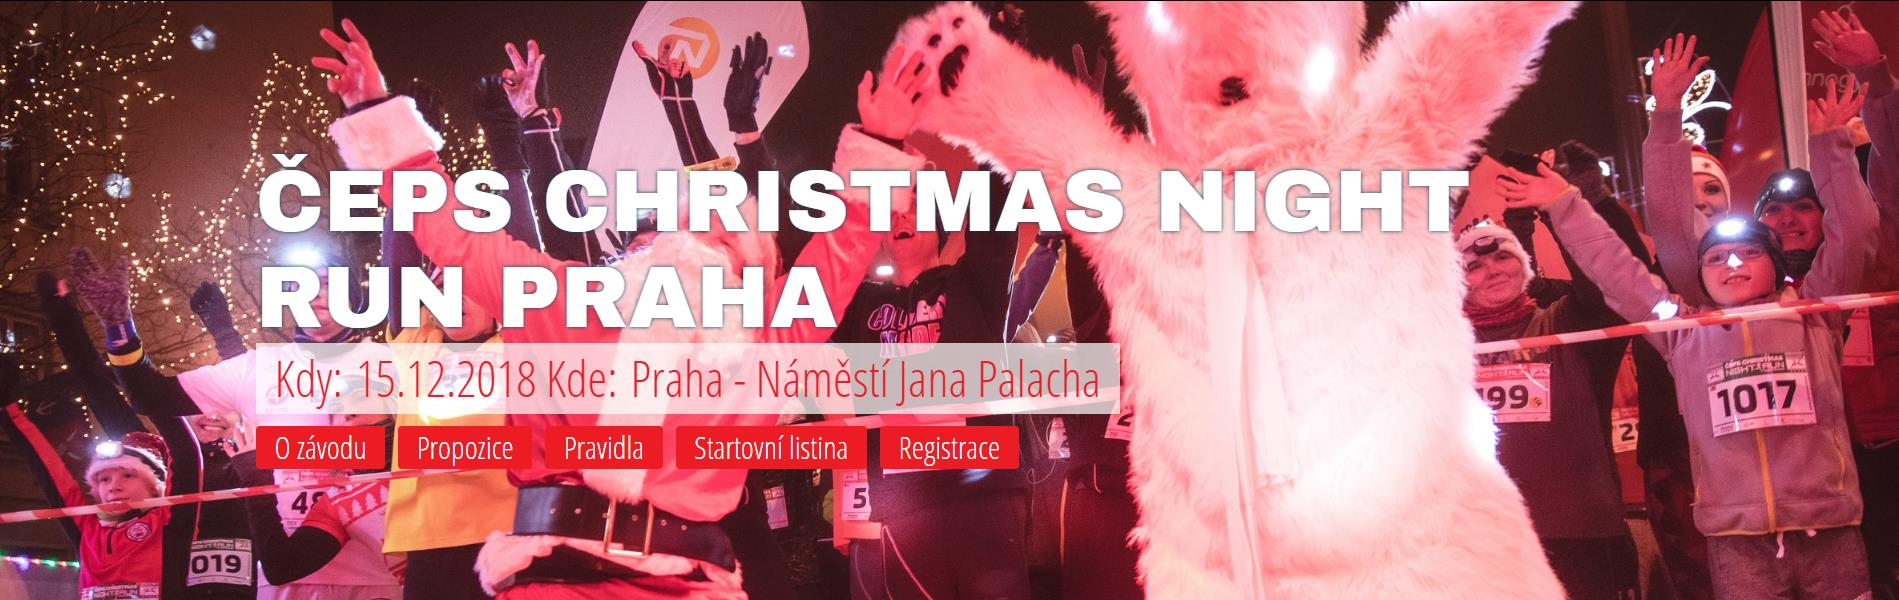 ČEPS Christmas NIGHT RUN Praha 2018